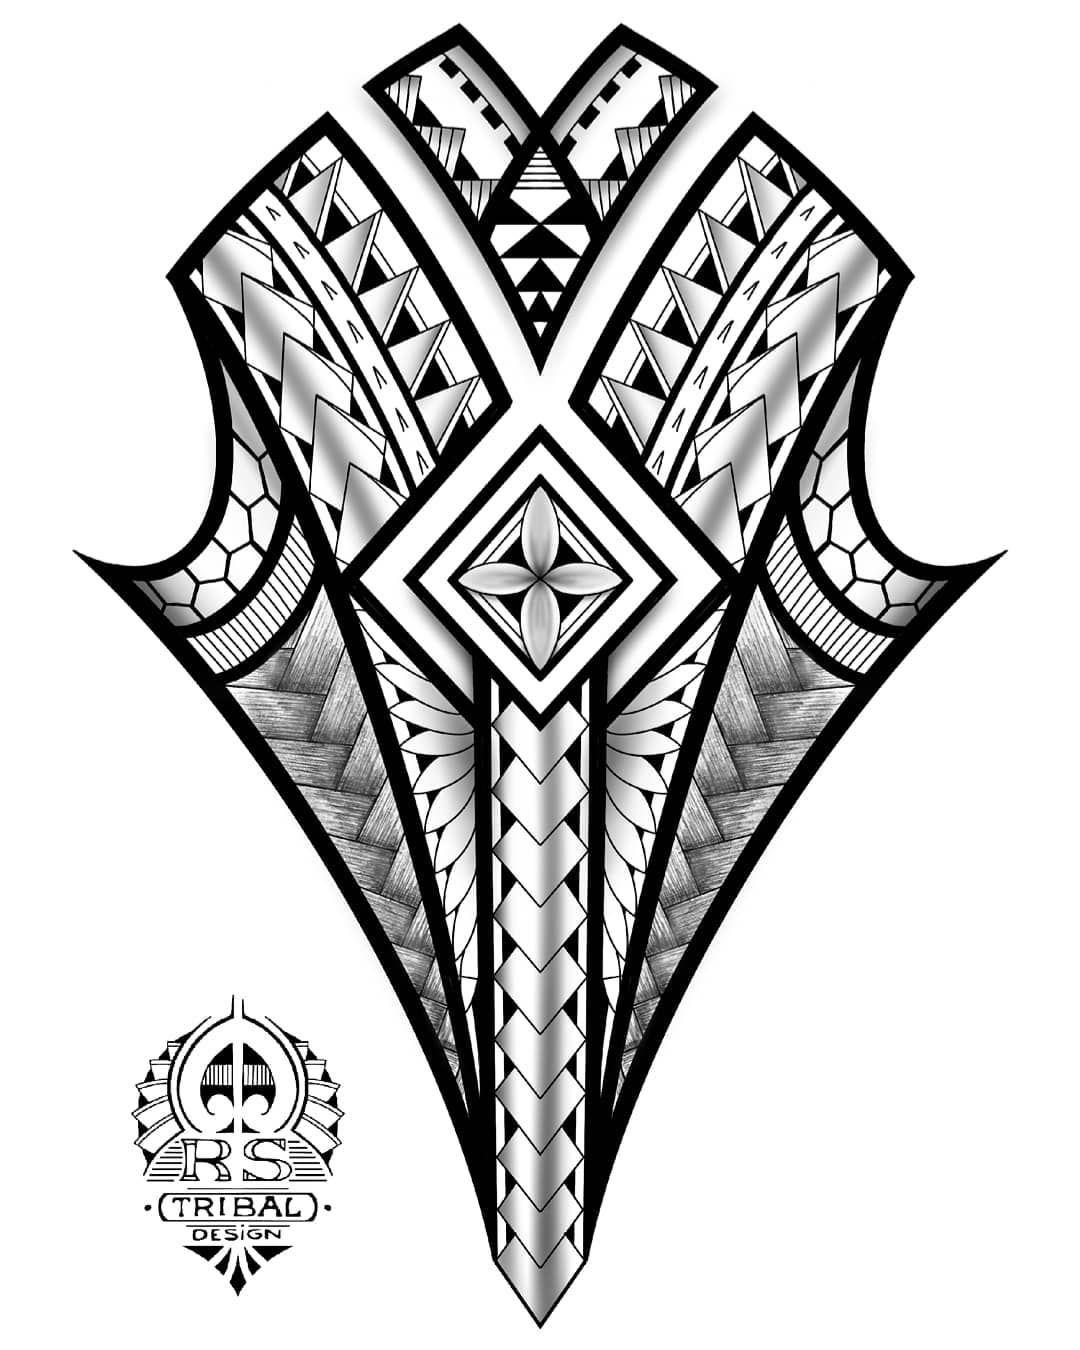 Polynesian Inspired Design Tribaltattoo Polynesiantattoo Maoritattoo Polynesian Polytat Designe Maori Tattoo Polynesian Tattoo Polynesian Tattoo Designs